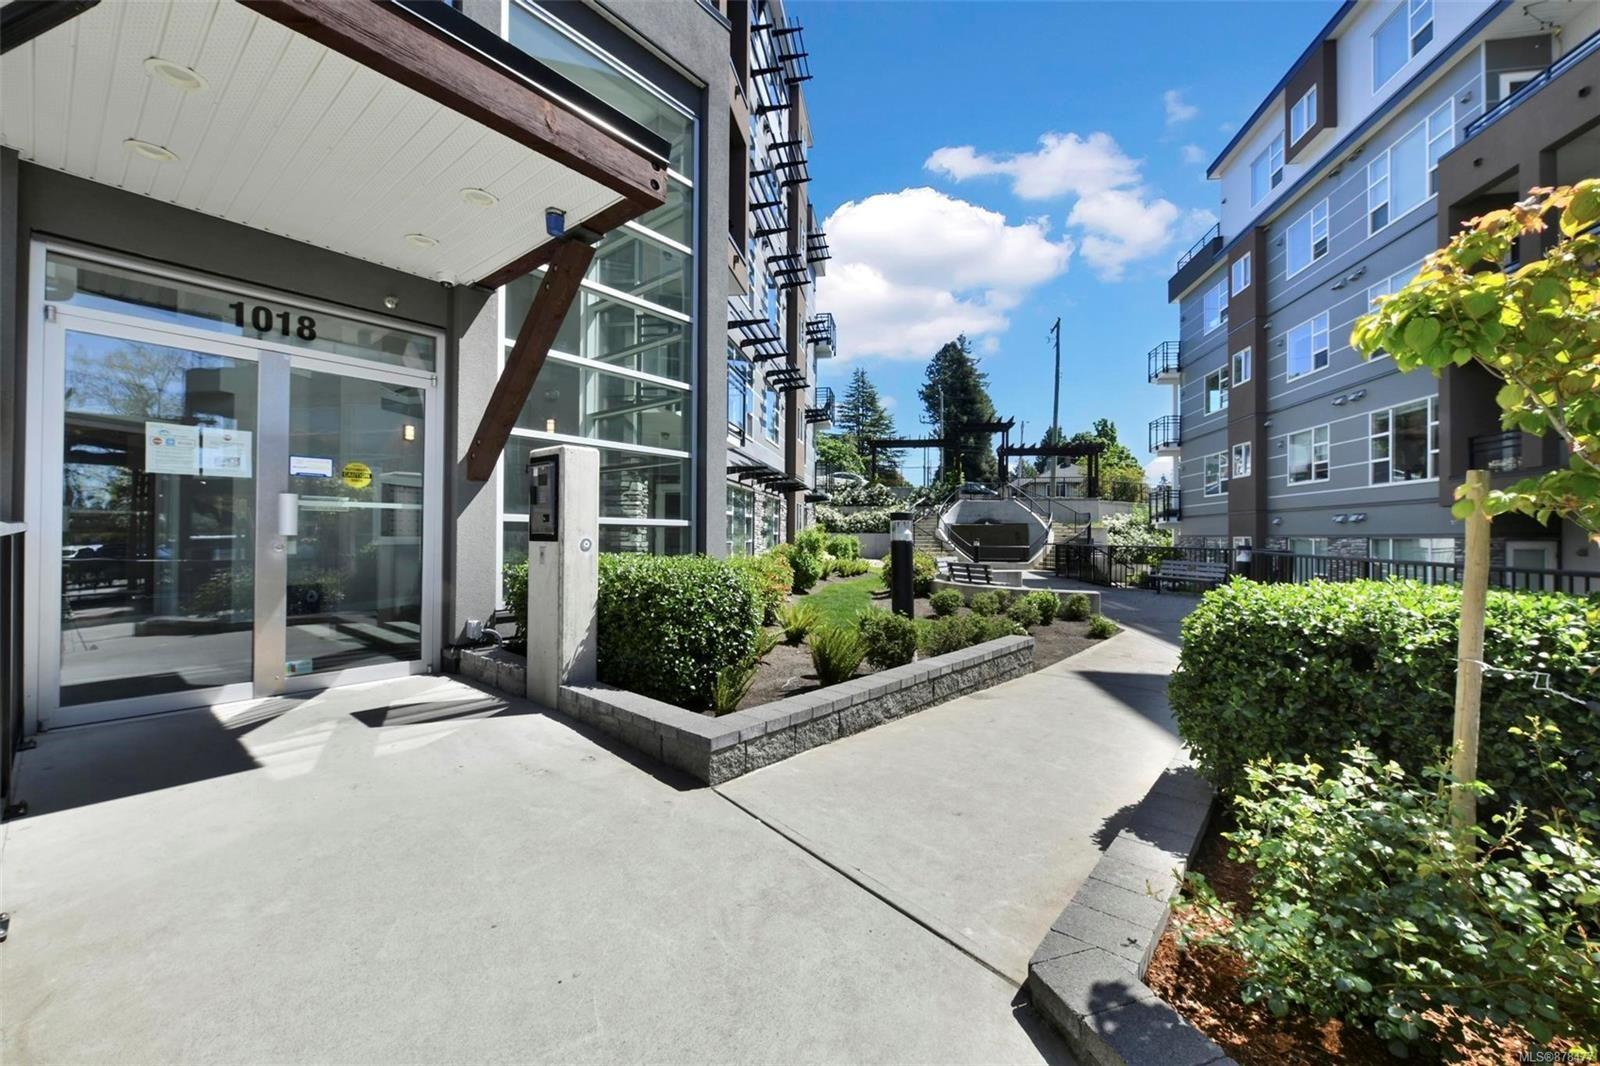 Main Photo: 501 1018 Inverness Rd in : SE Quadra Condo for sale (Saanich East)  : MLS®# 878477